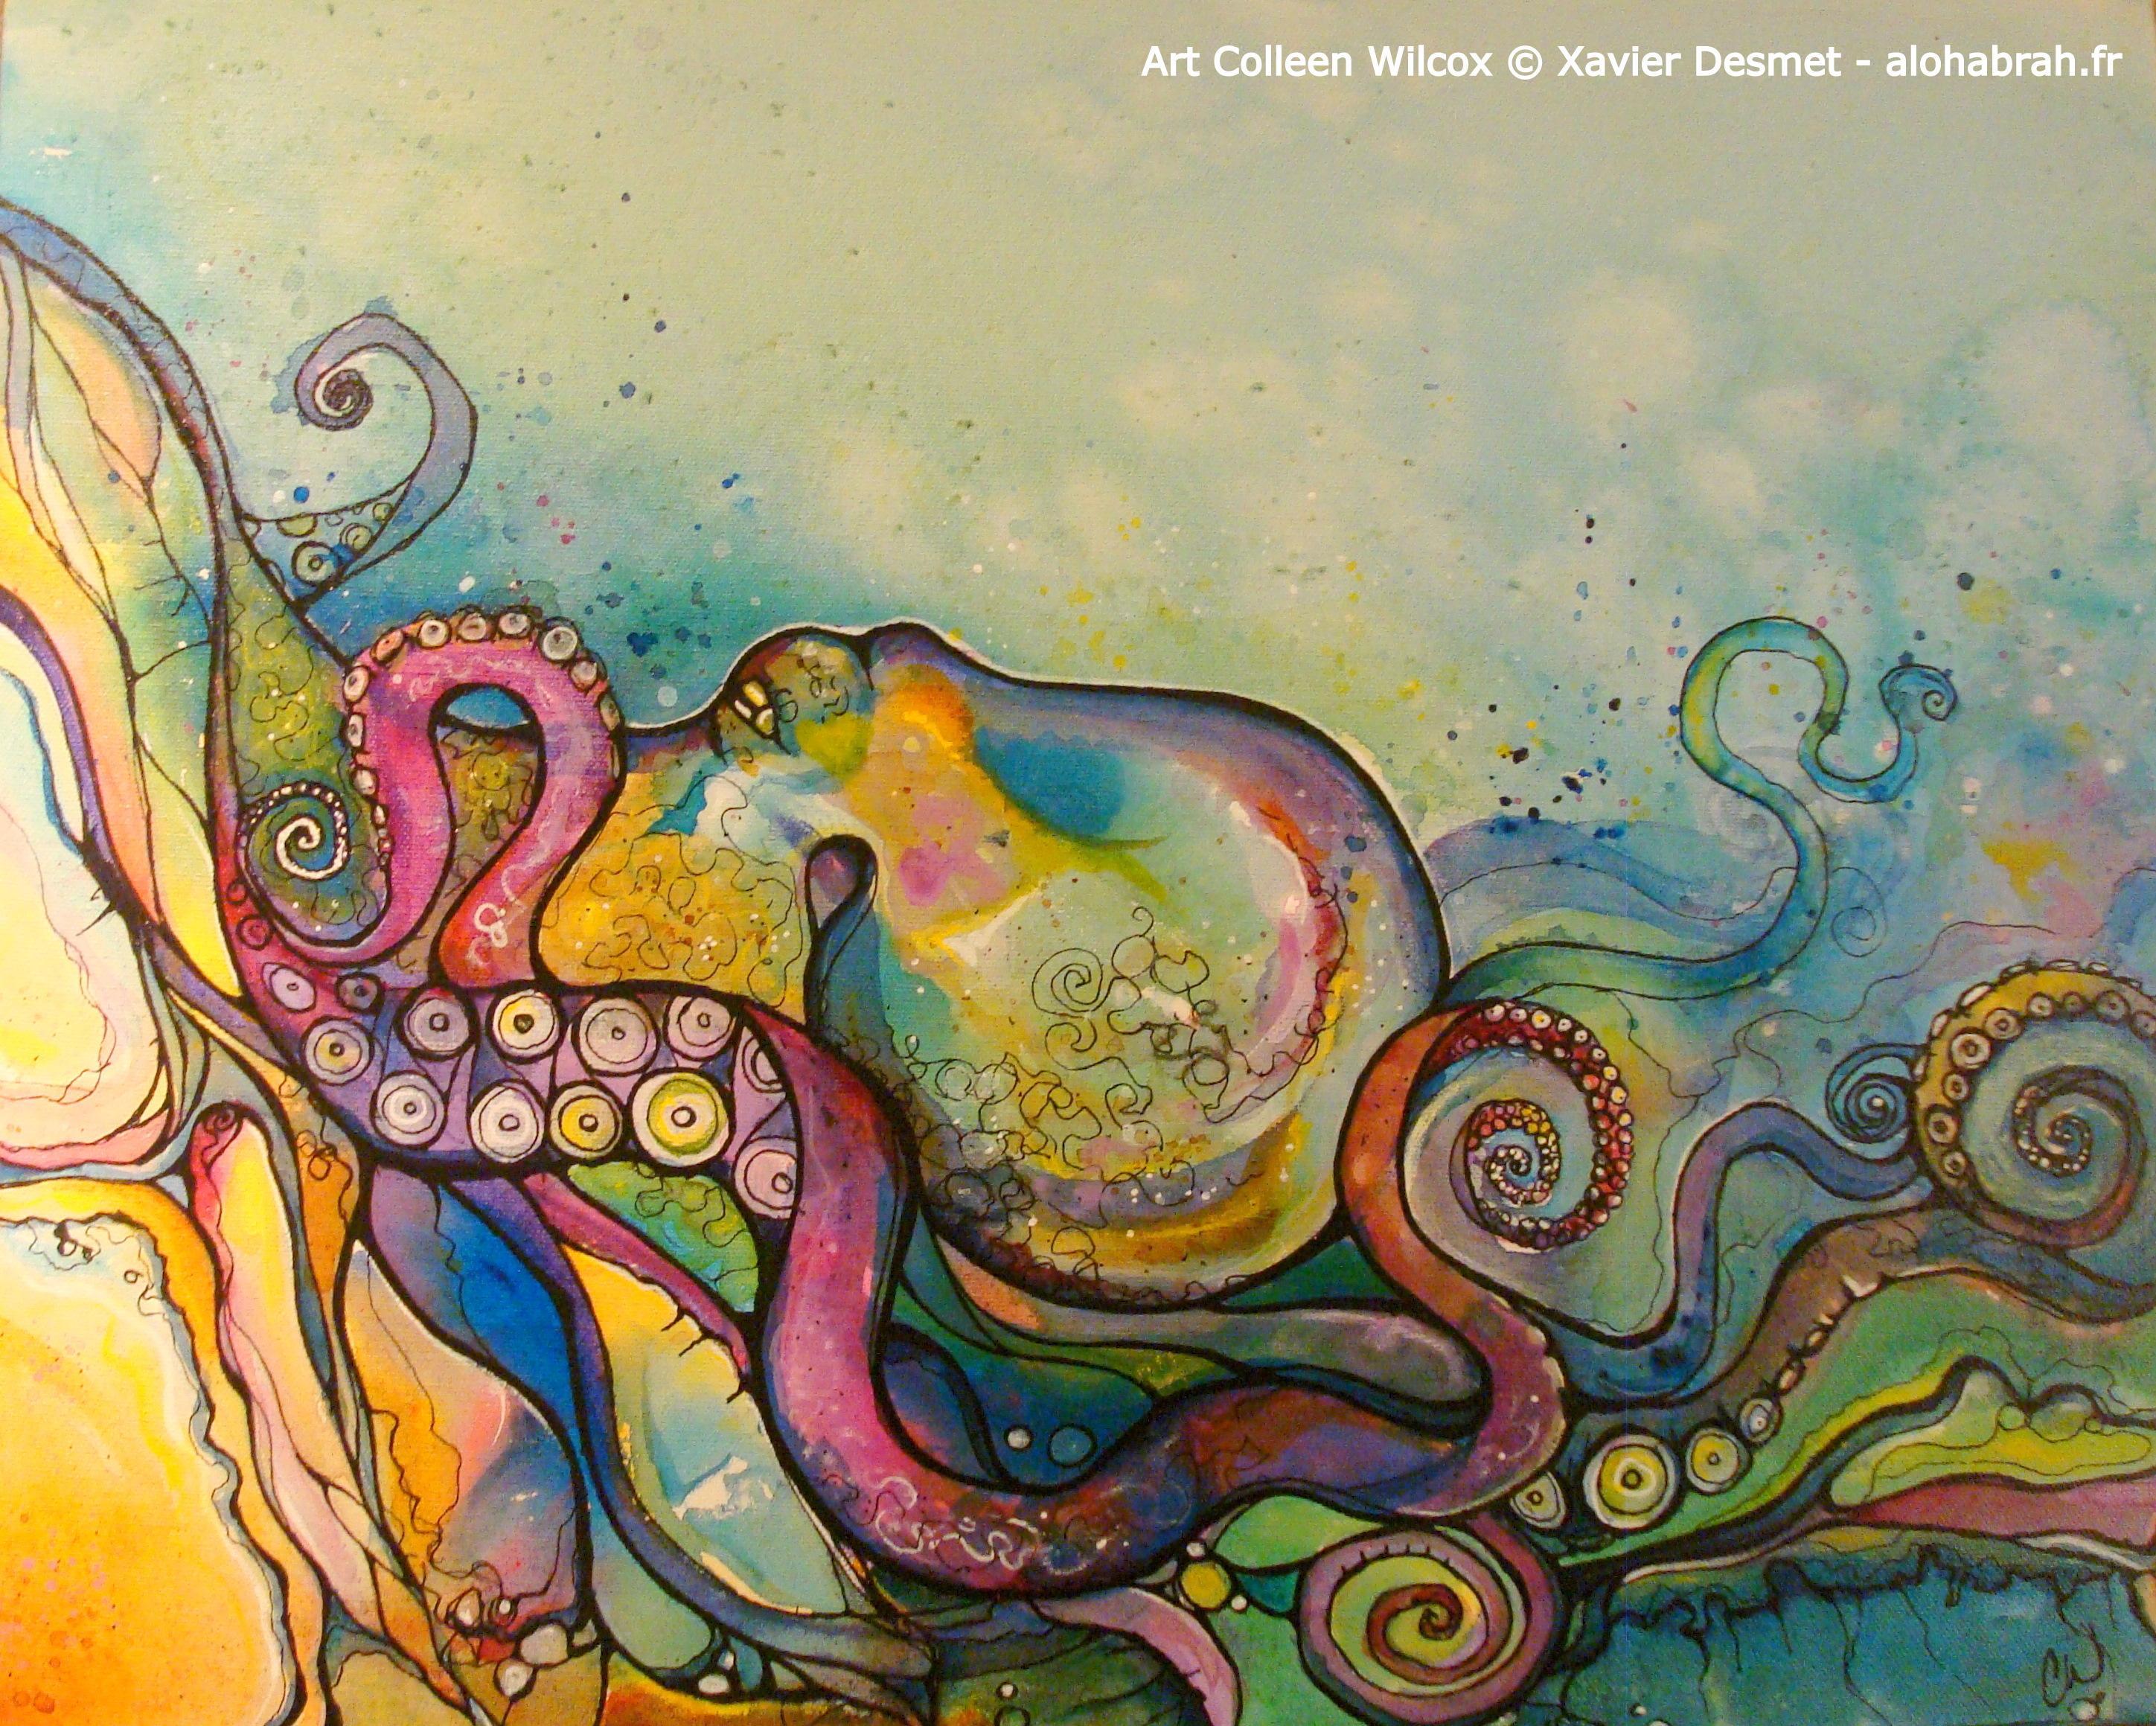 Poulpe - Art Colleen Wilcox © Xavier Desmet - alohabrah.fr